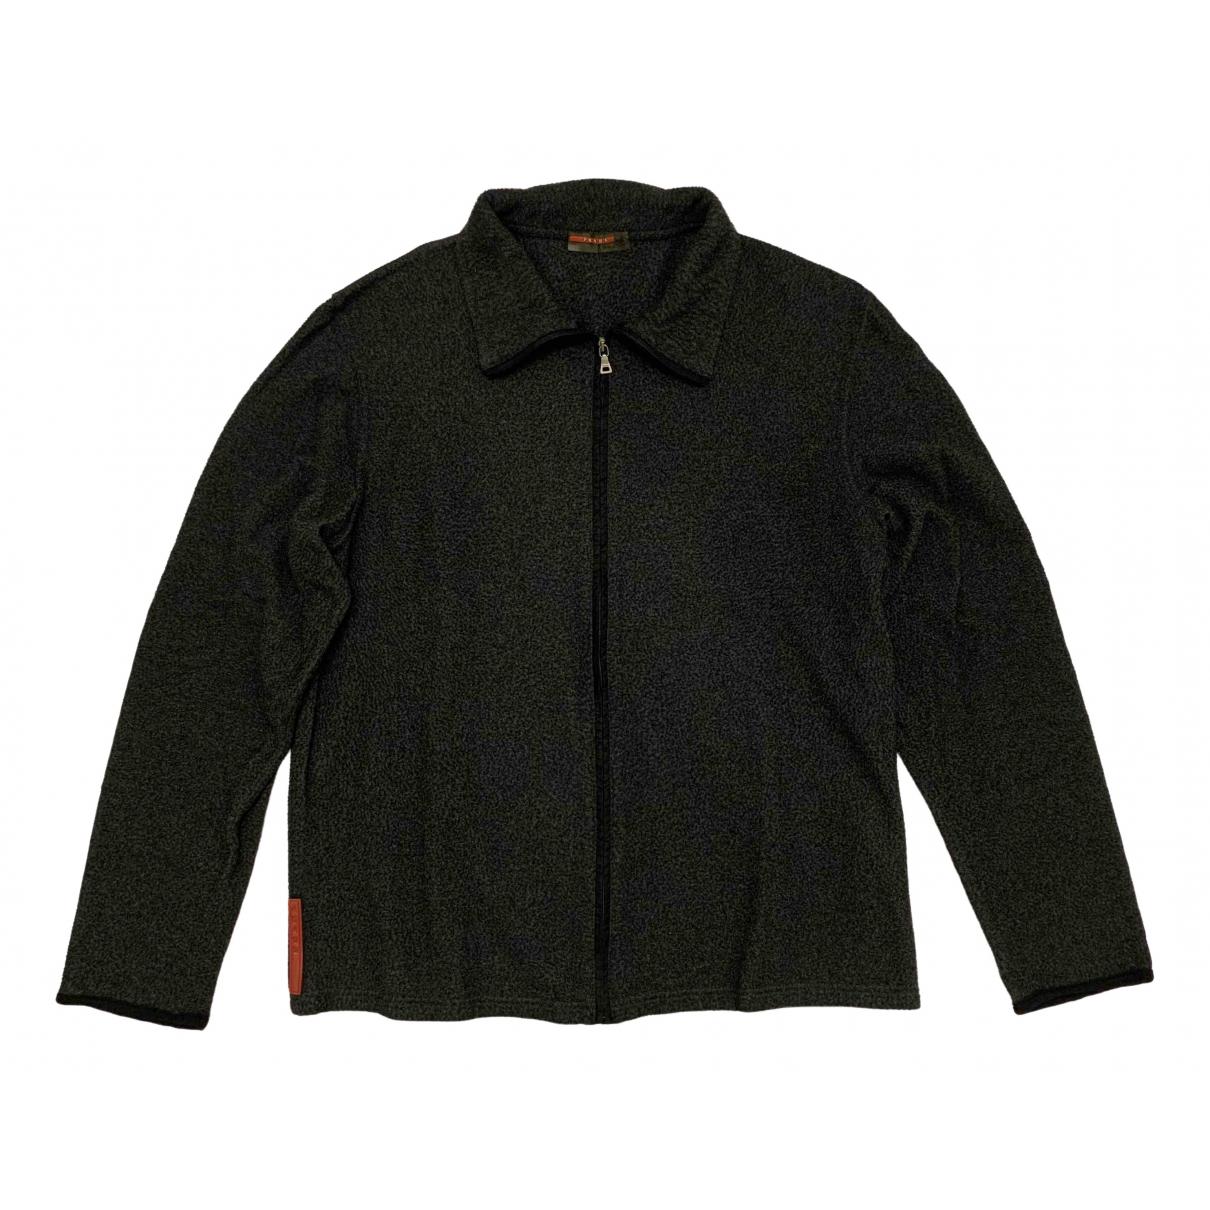 Prada \N Grey Wool jacket  for Men L International